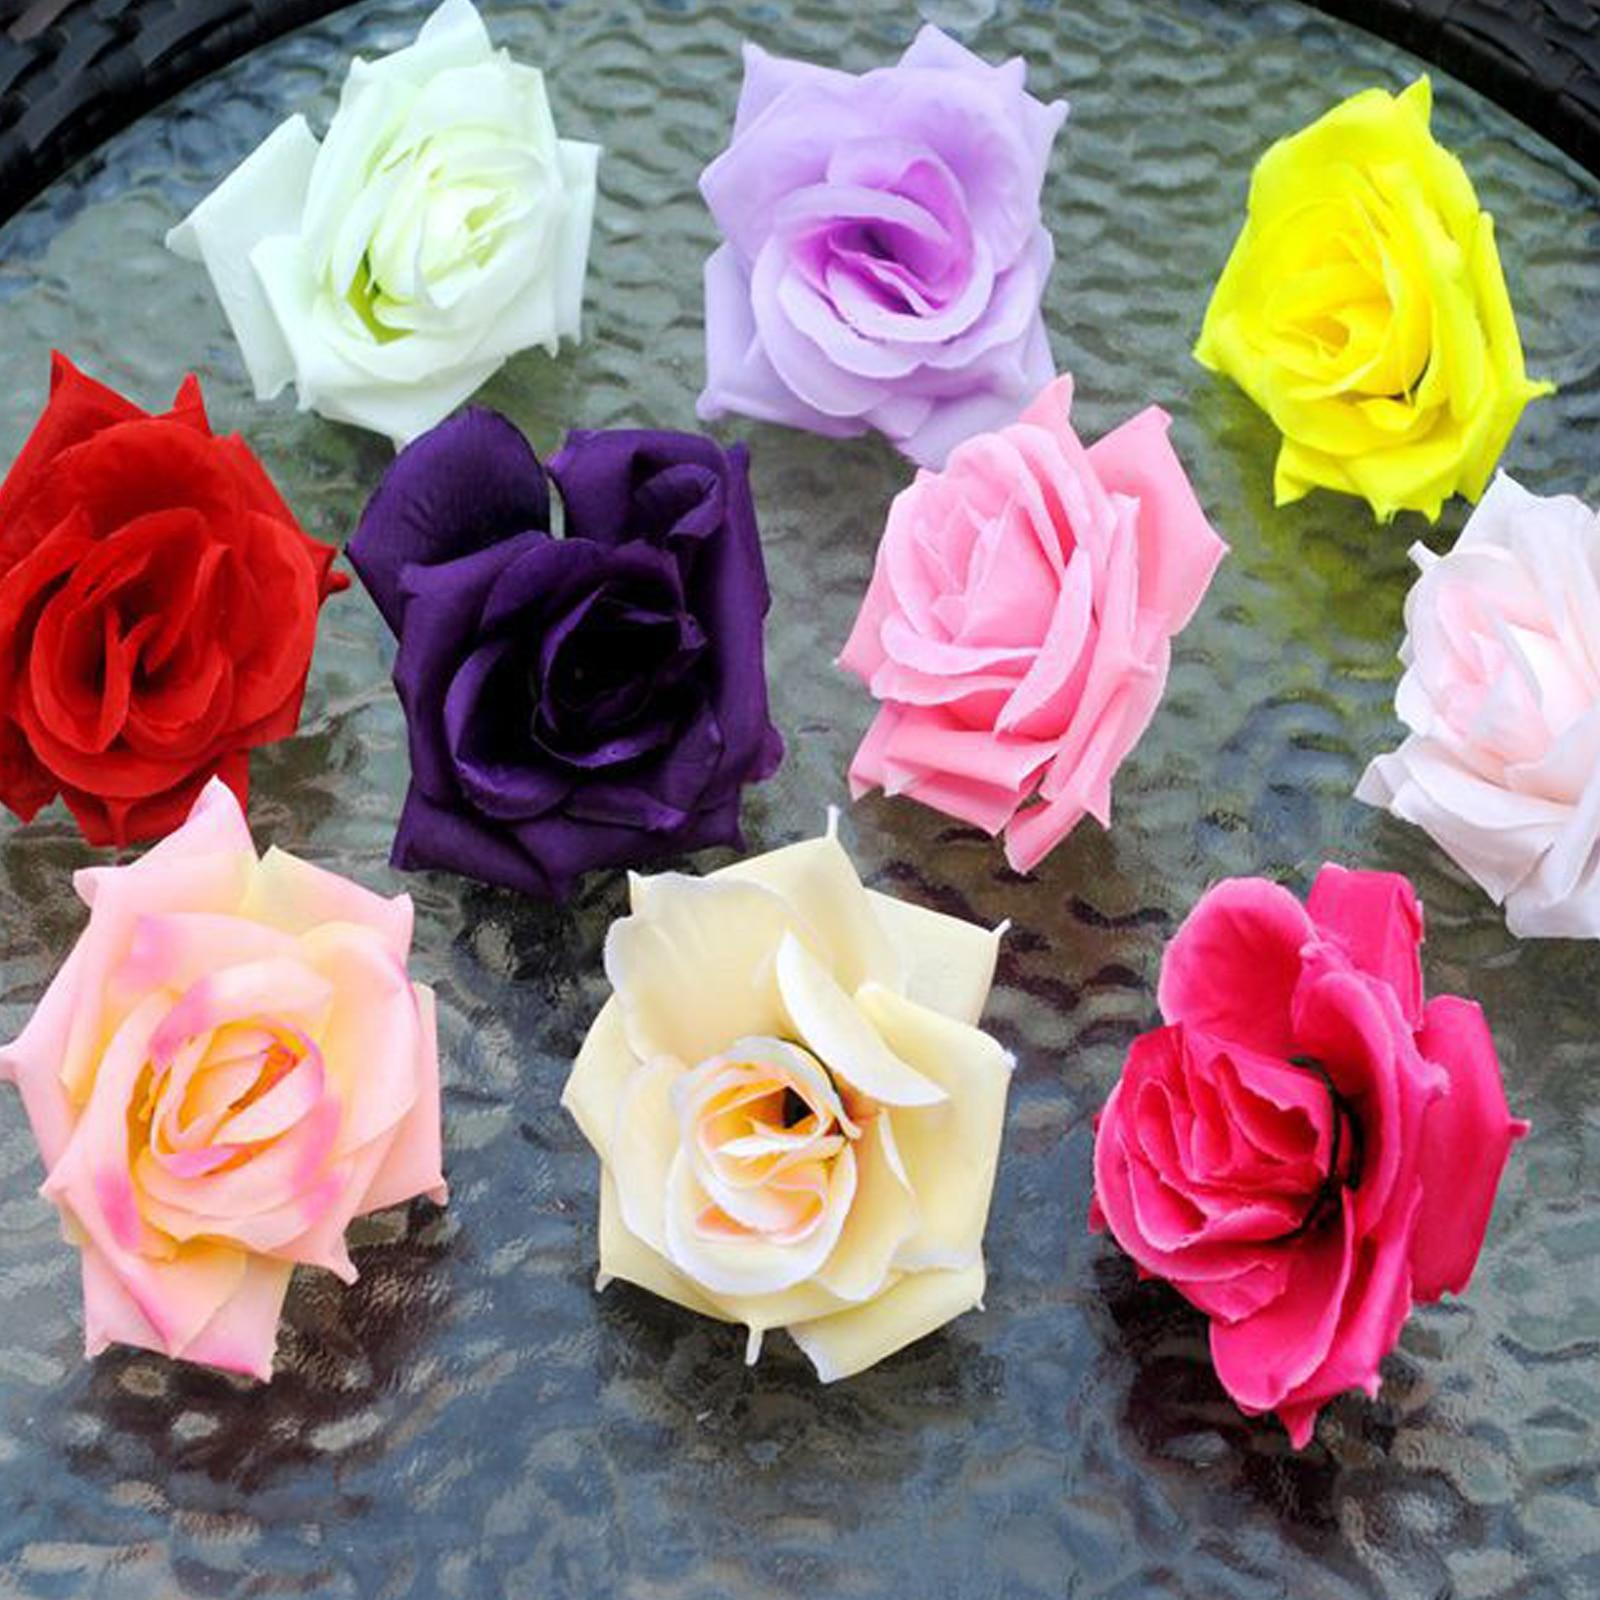 Fake flowers for crafts - 50pcs 8cm Diy Handmade Silk Rose Flowers Head Arti